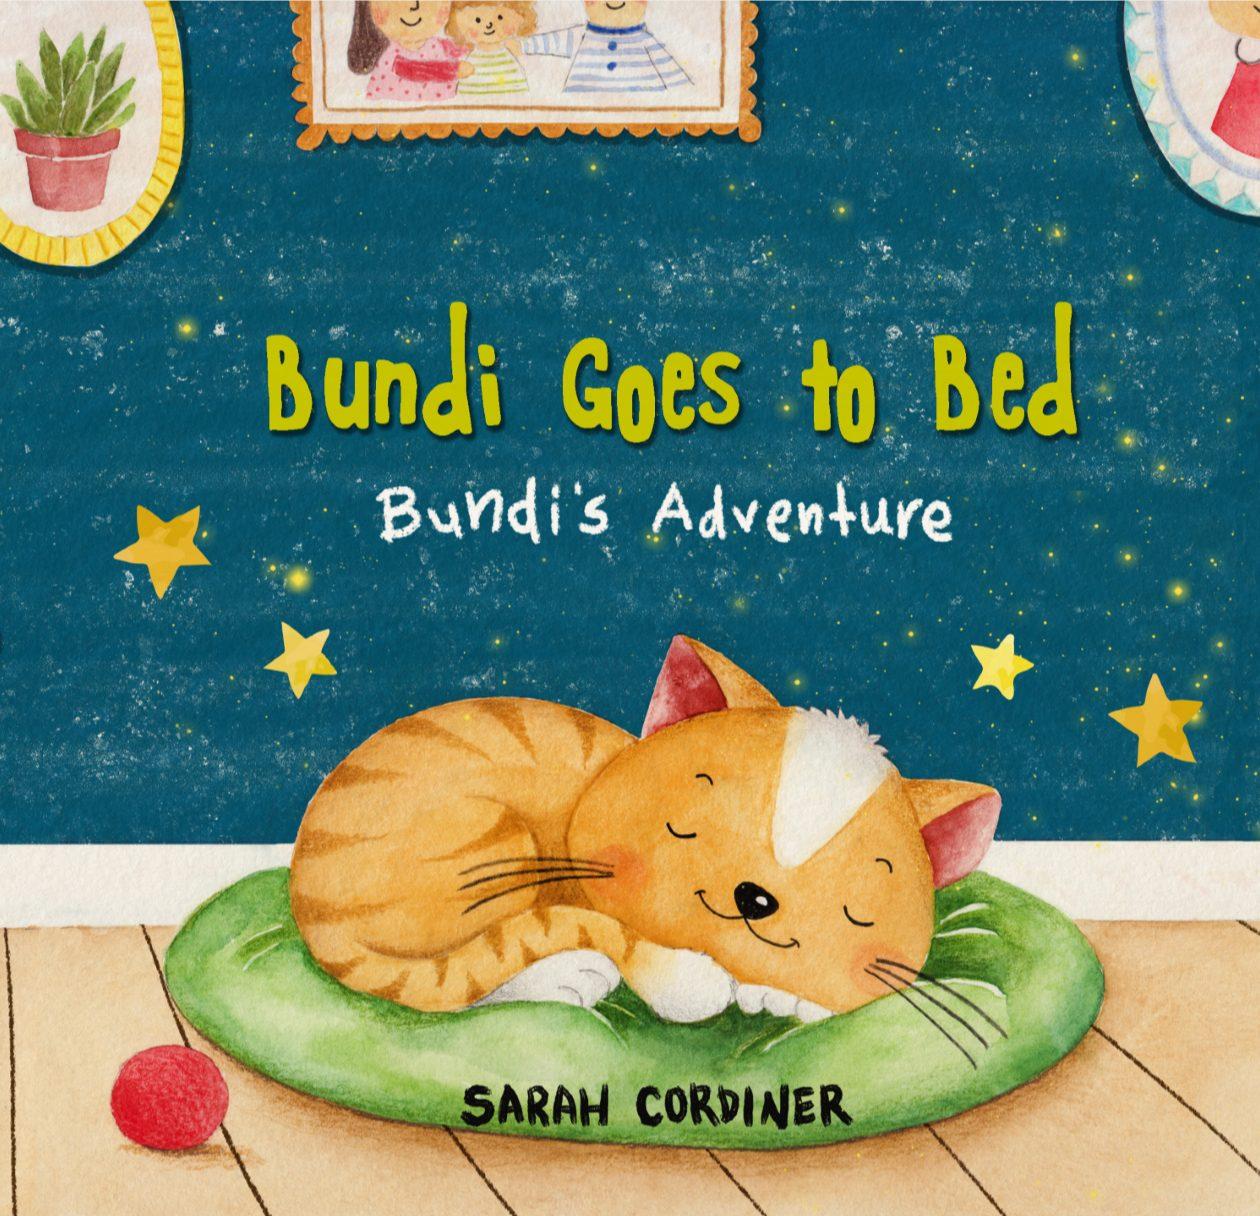 Bundi Goes to Bed - Childrens Book Sarah Cordiner